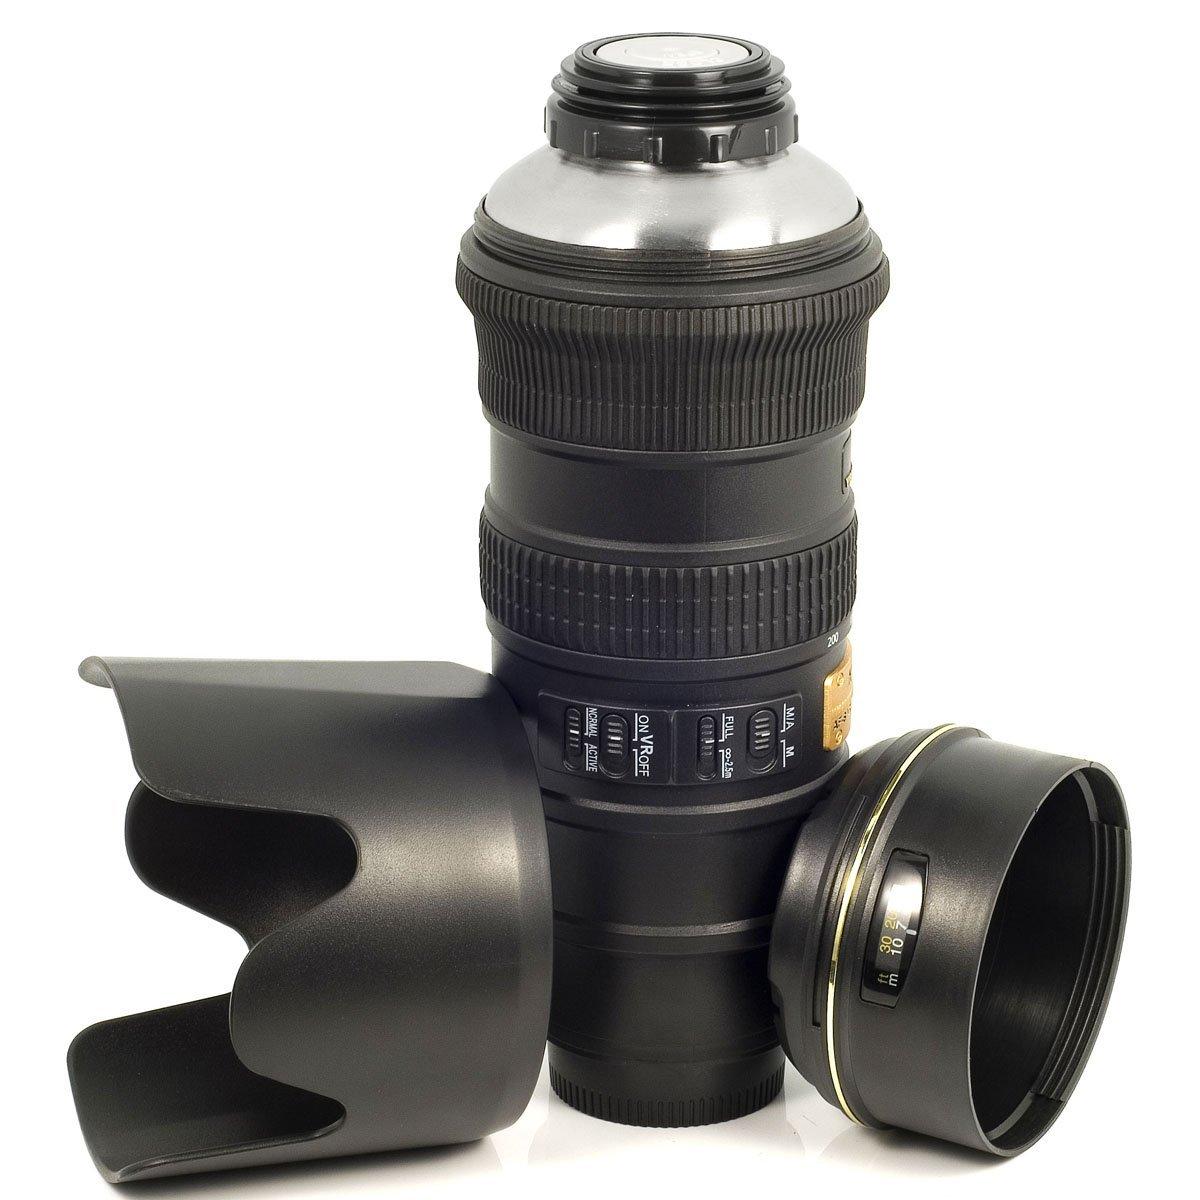 Kamera-Objektiv Reise Thermokanne AF-S 70-200mm